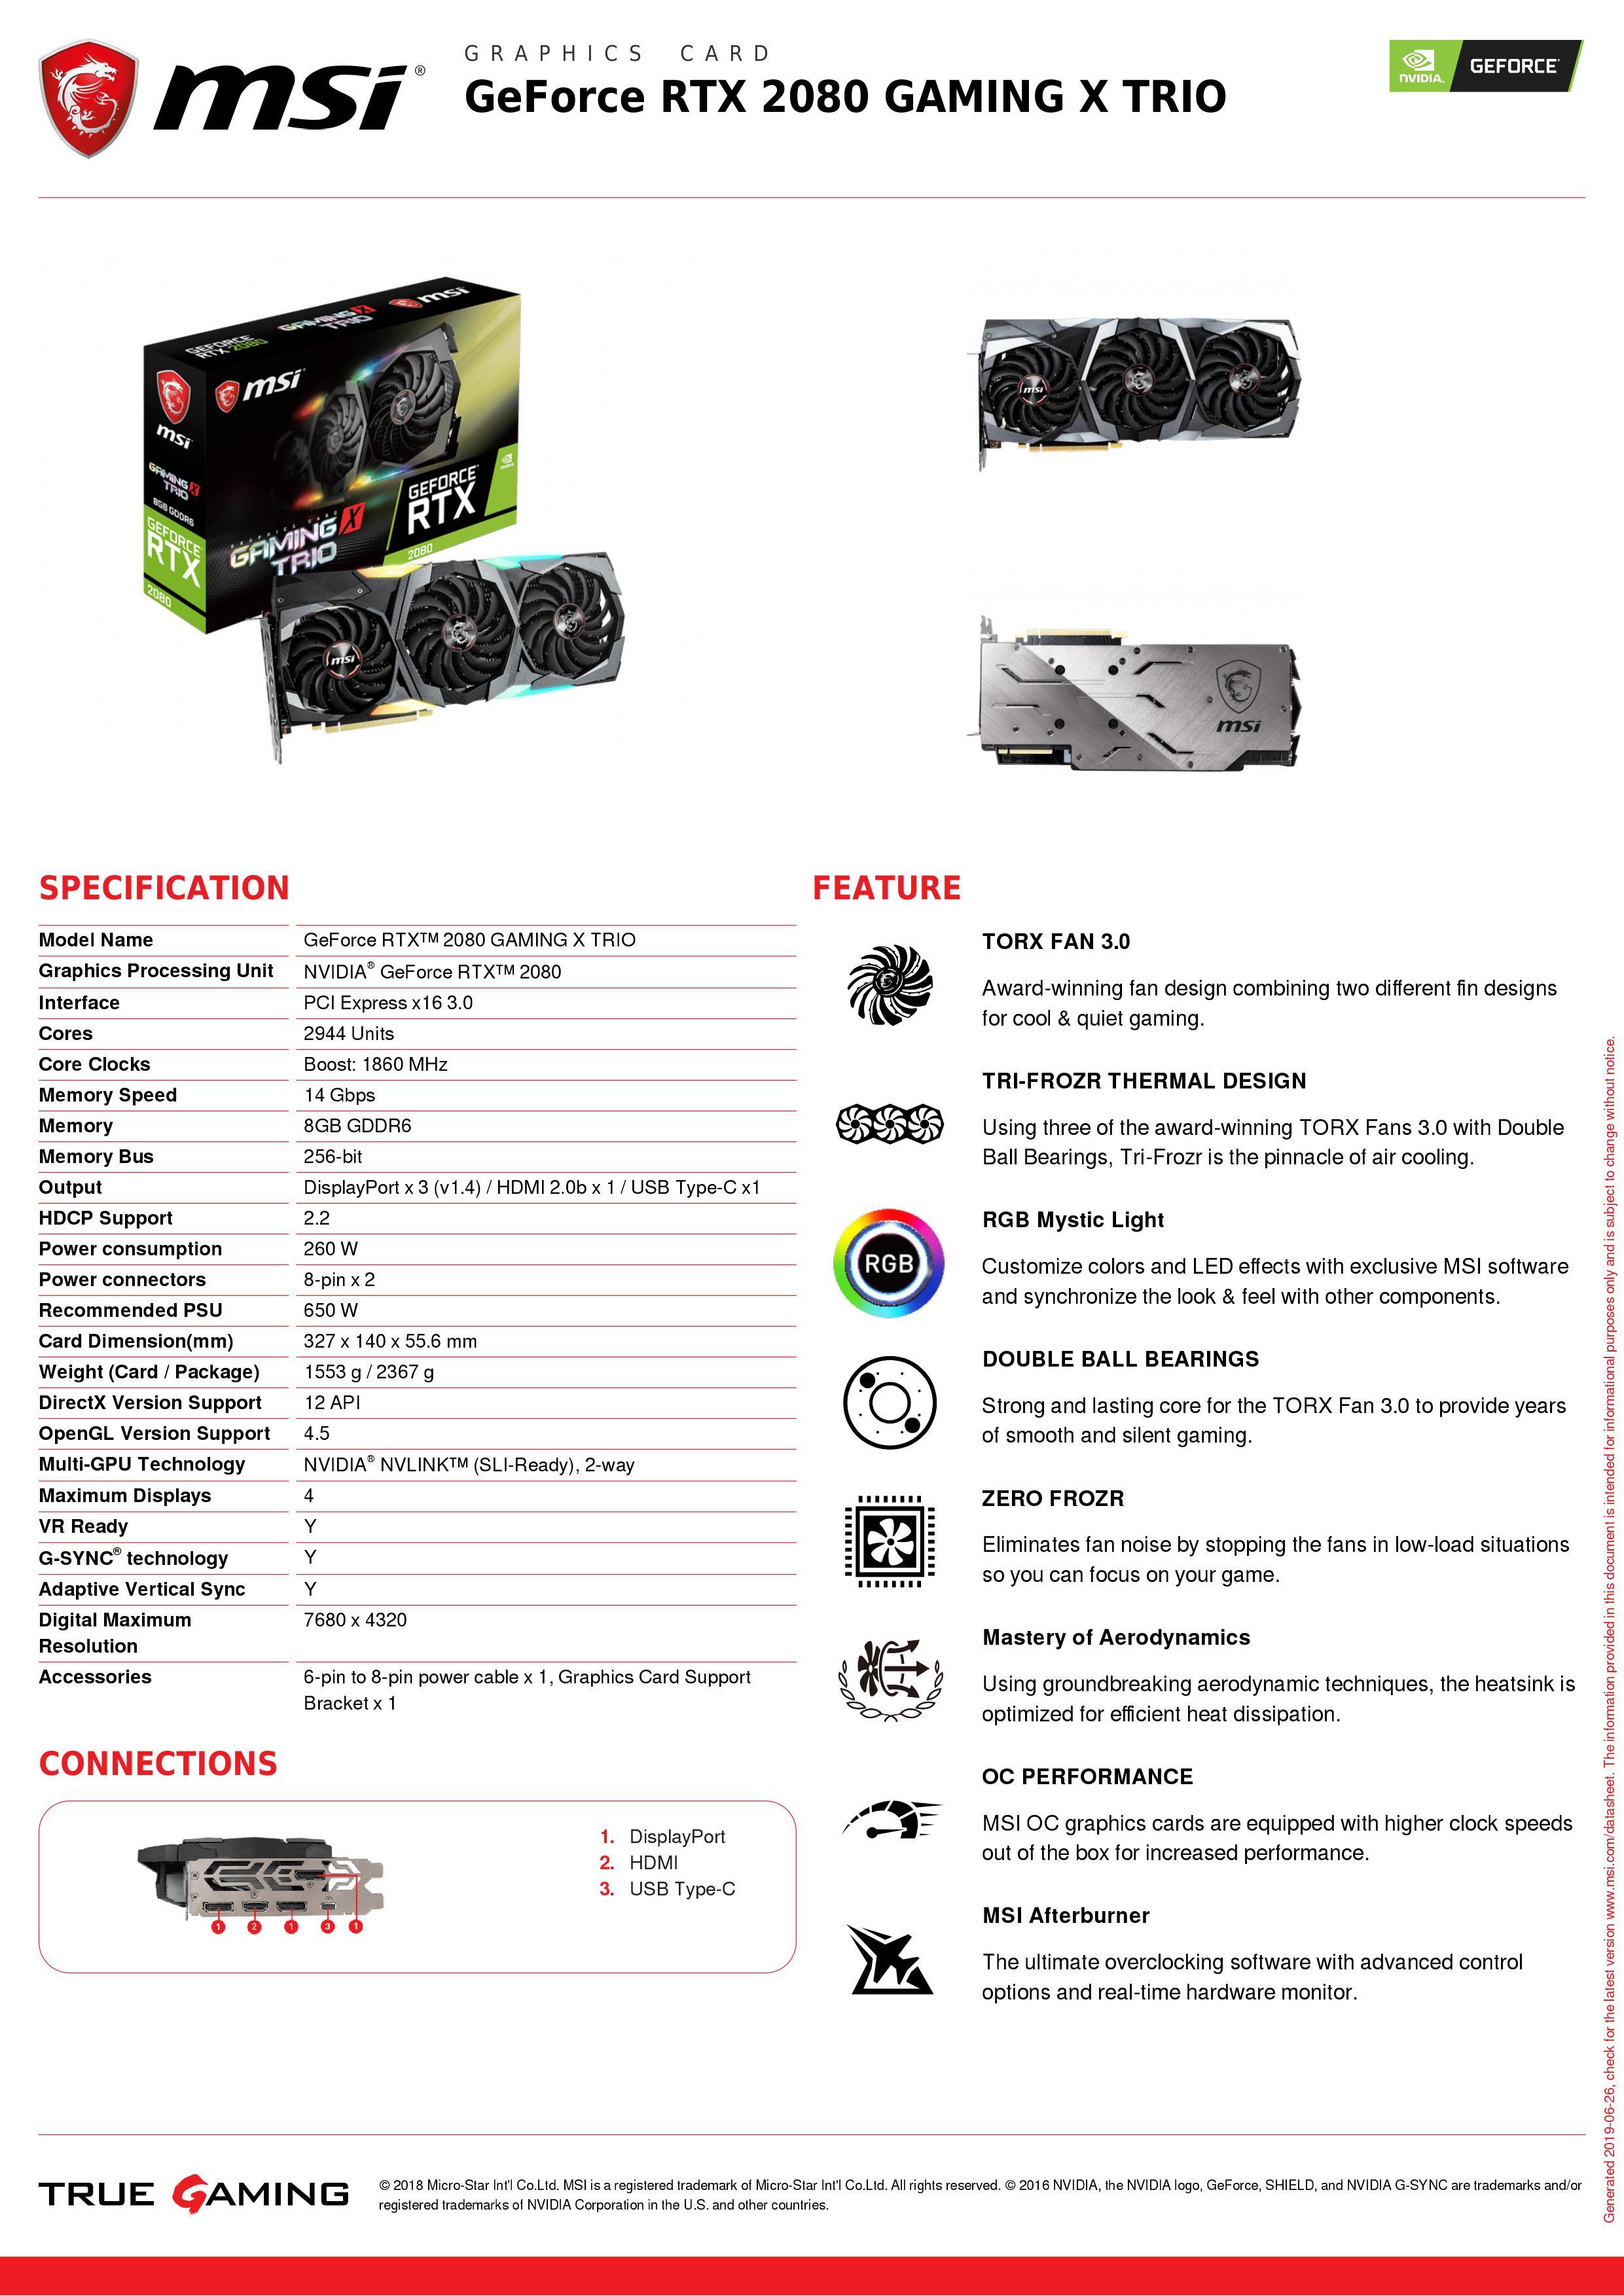 FLASH SALE] MSI видеокарта GeForce RTX 2080 GAMING X TRIO